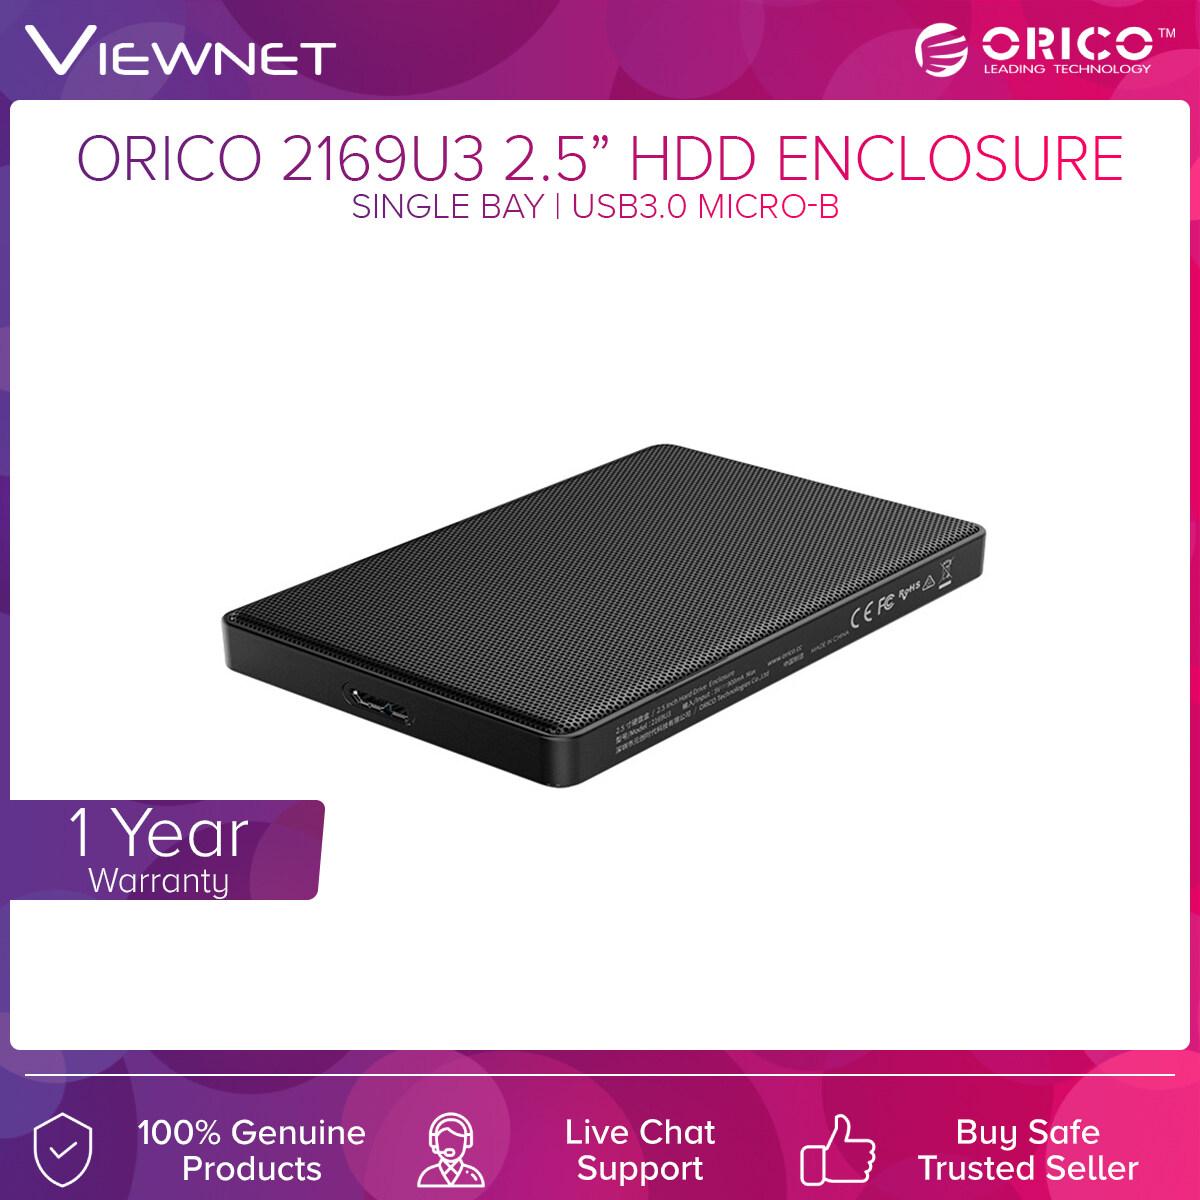 Orico2.5 USB3.0 SATA Enclosure (2169U3-BK), 5Gbps Transfer Speed, Up To 4TB Capacity,Screw Installation, Support Windows/ Mac/ Linux